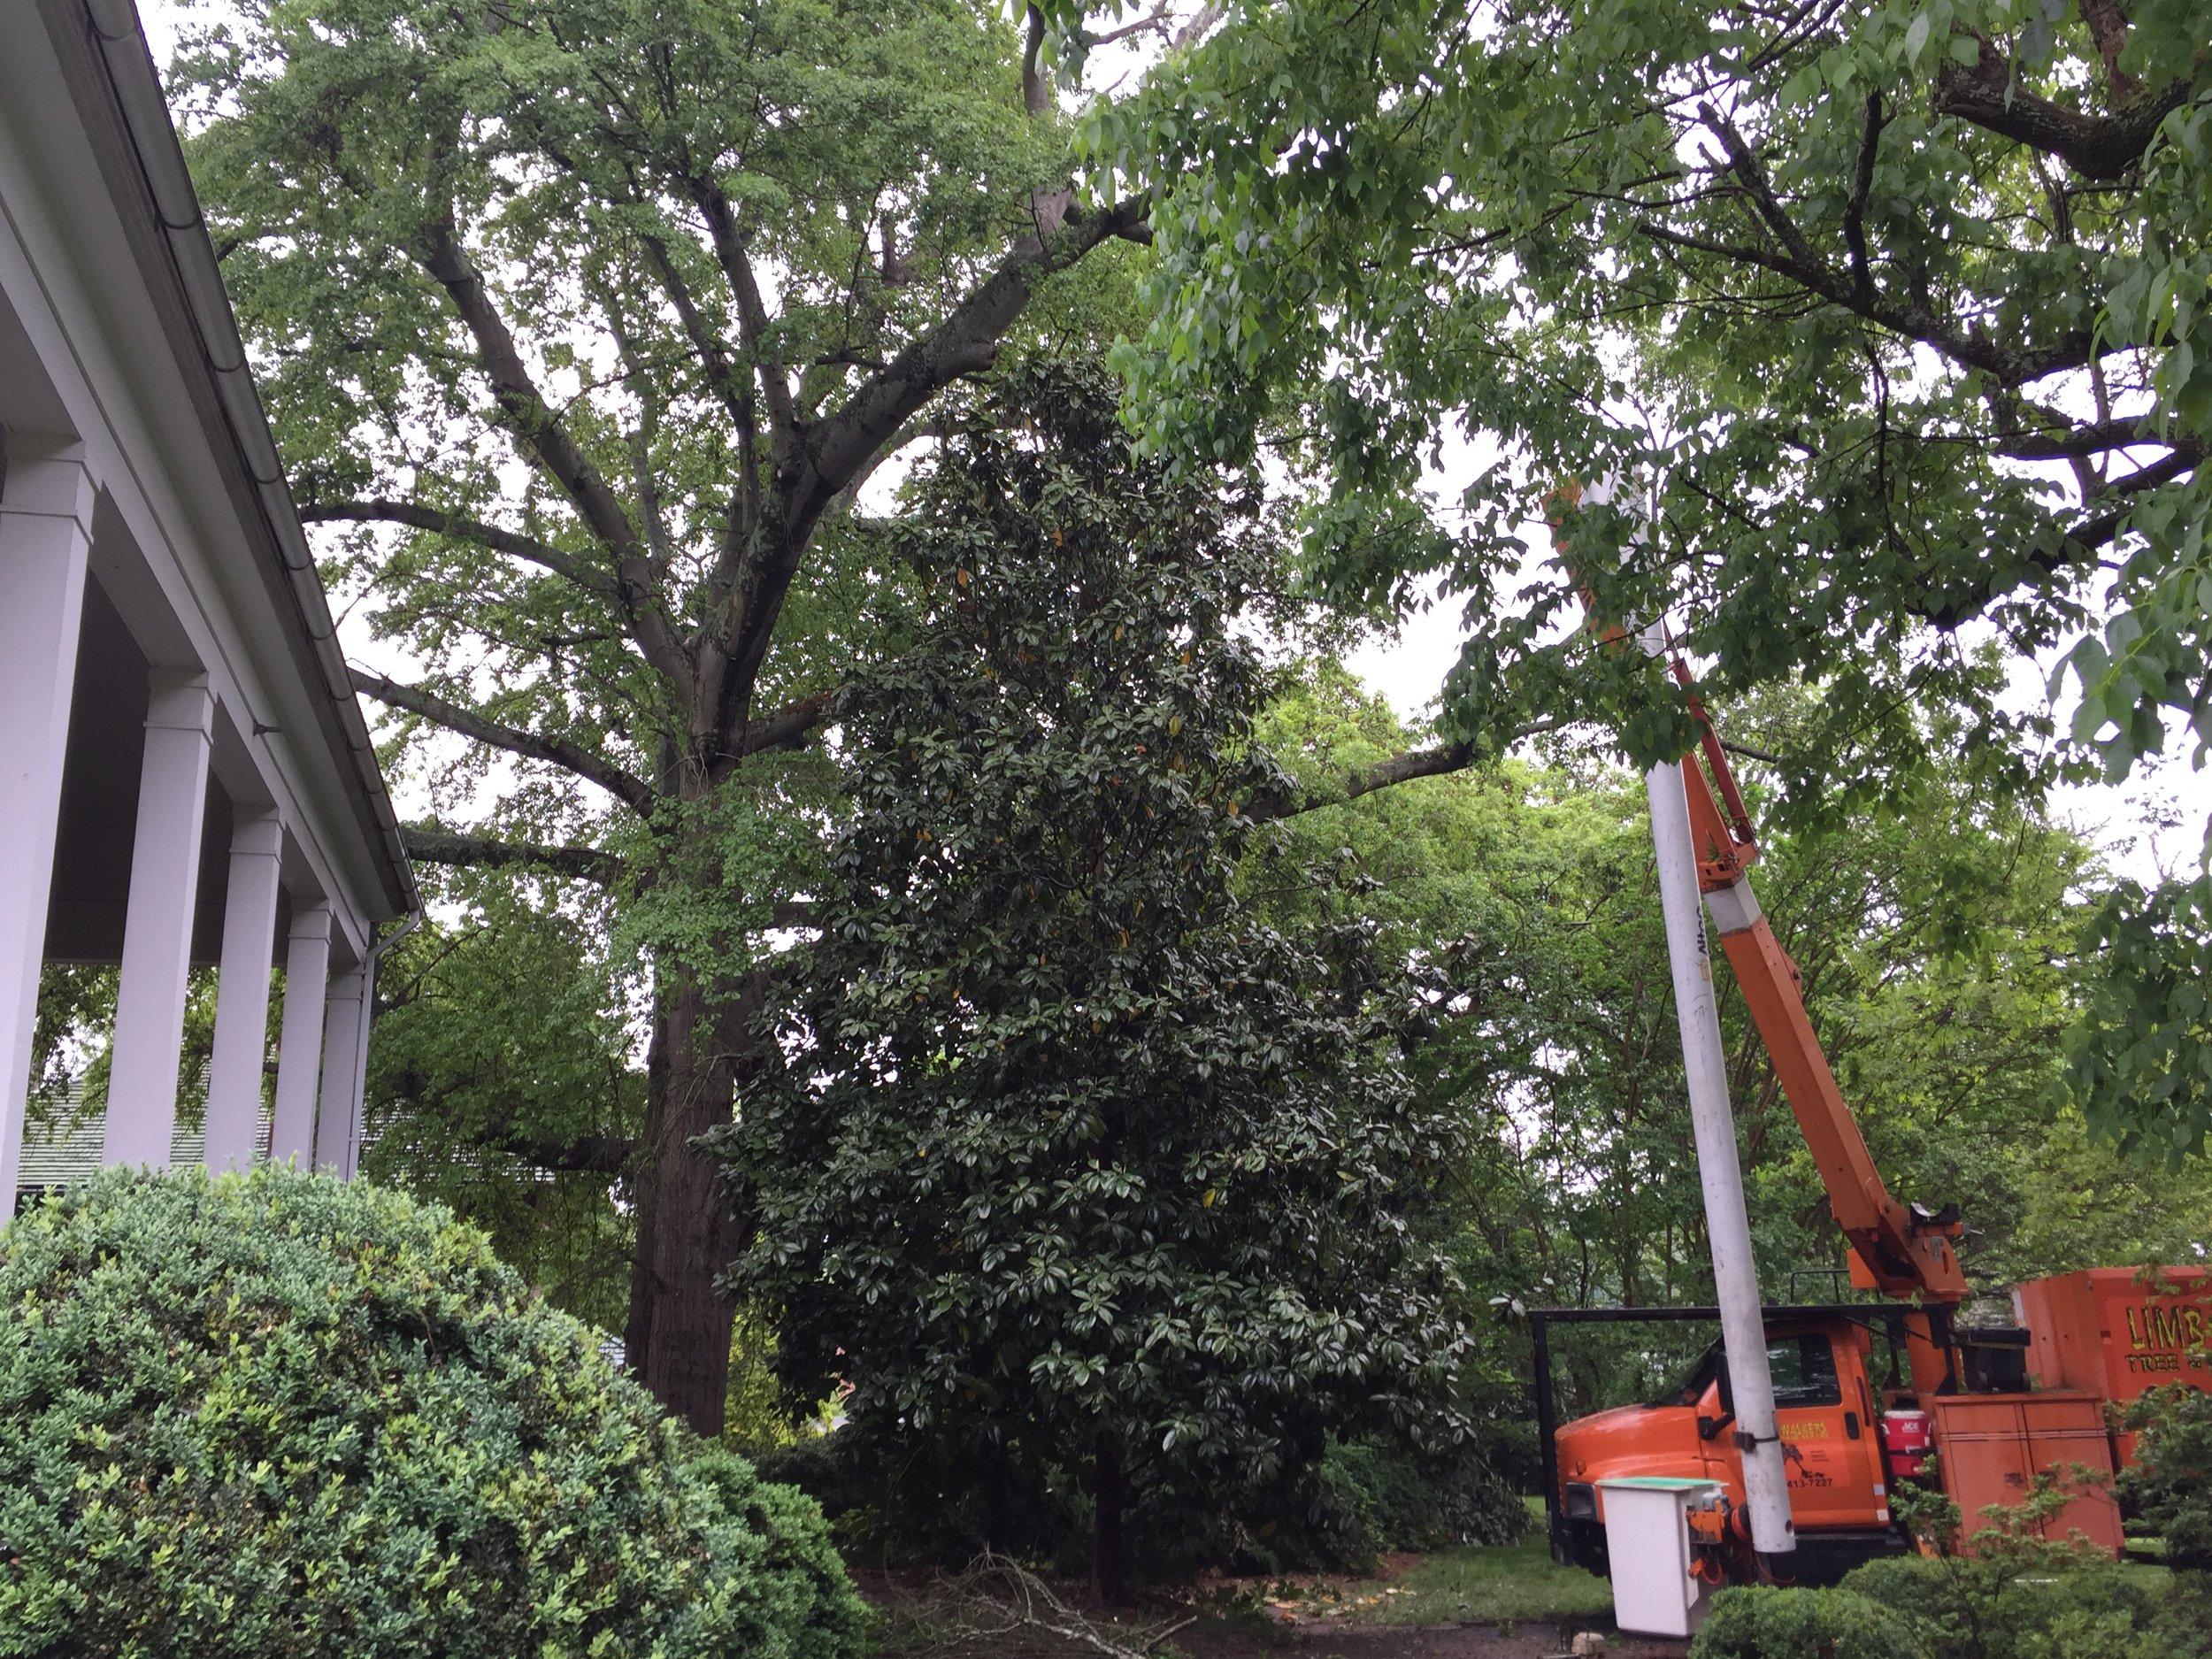 Morganton, NC tree service company, Limbwalkers Tree & Crane Service, deadwooding a tree near downtown Morganton.